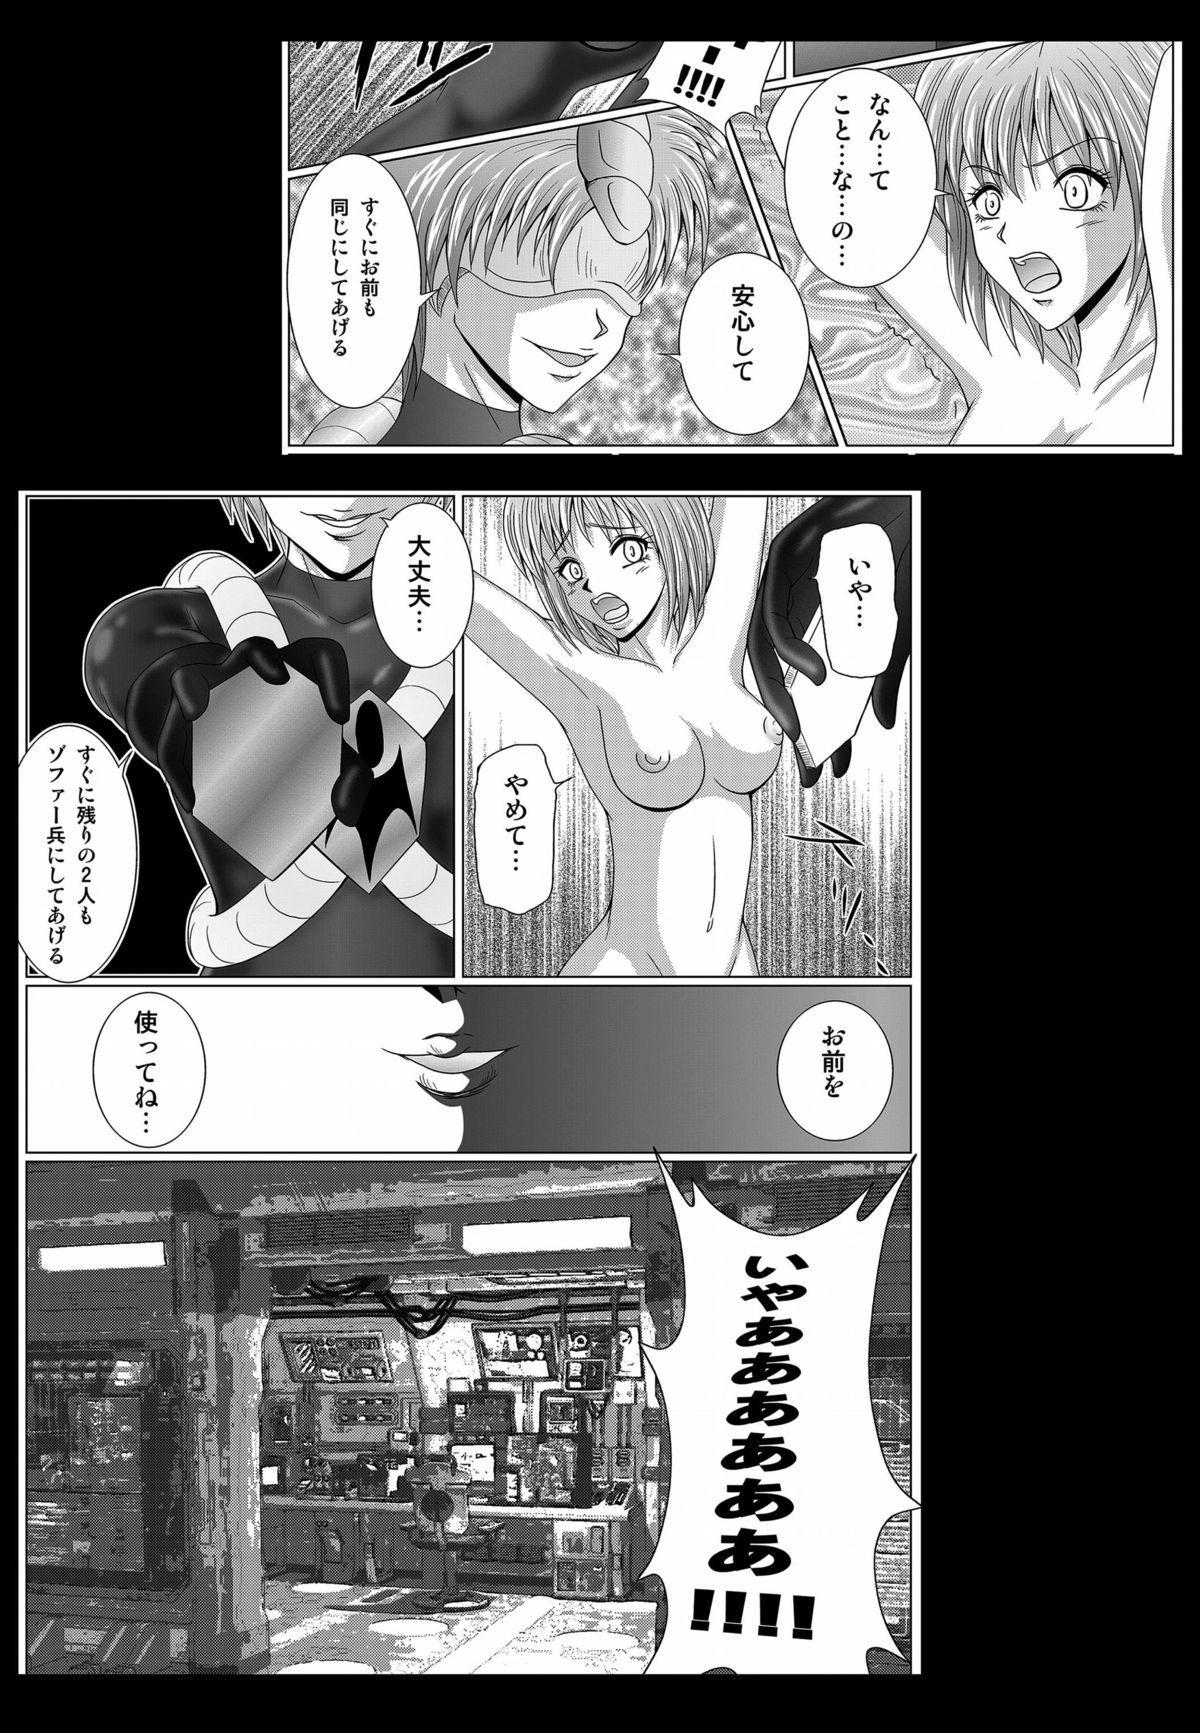 [Macxe's (monmon)] Tokubousentai Dinaranger ~Heroine Kairaku Sennou Keikaku~ Vol.01/02/03 (Renkaban) [Digital] 124